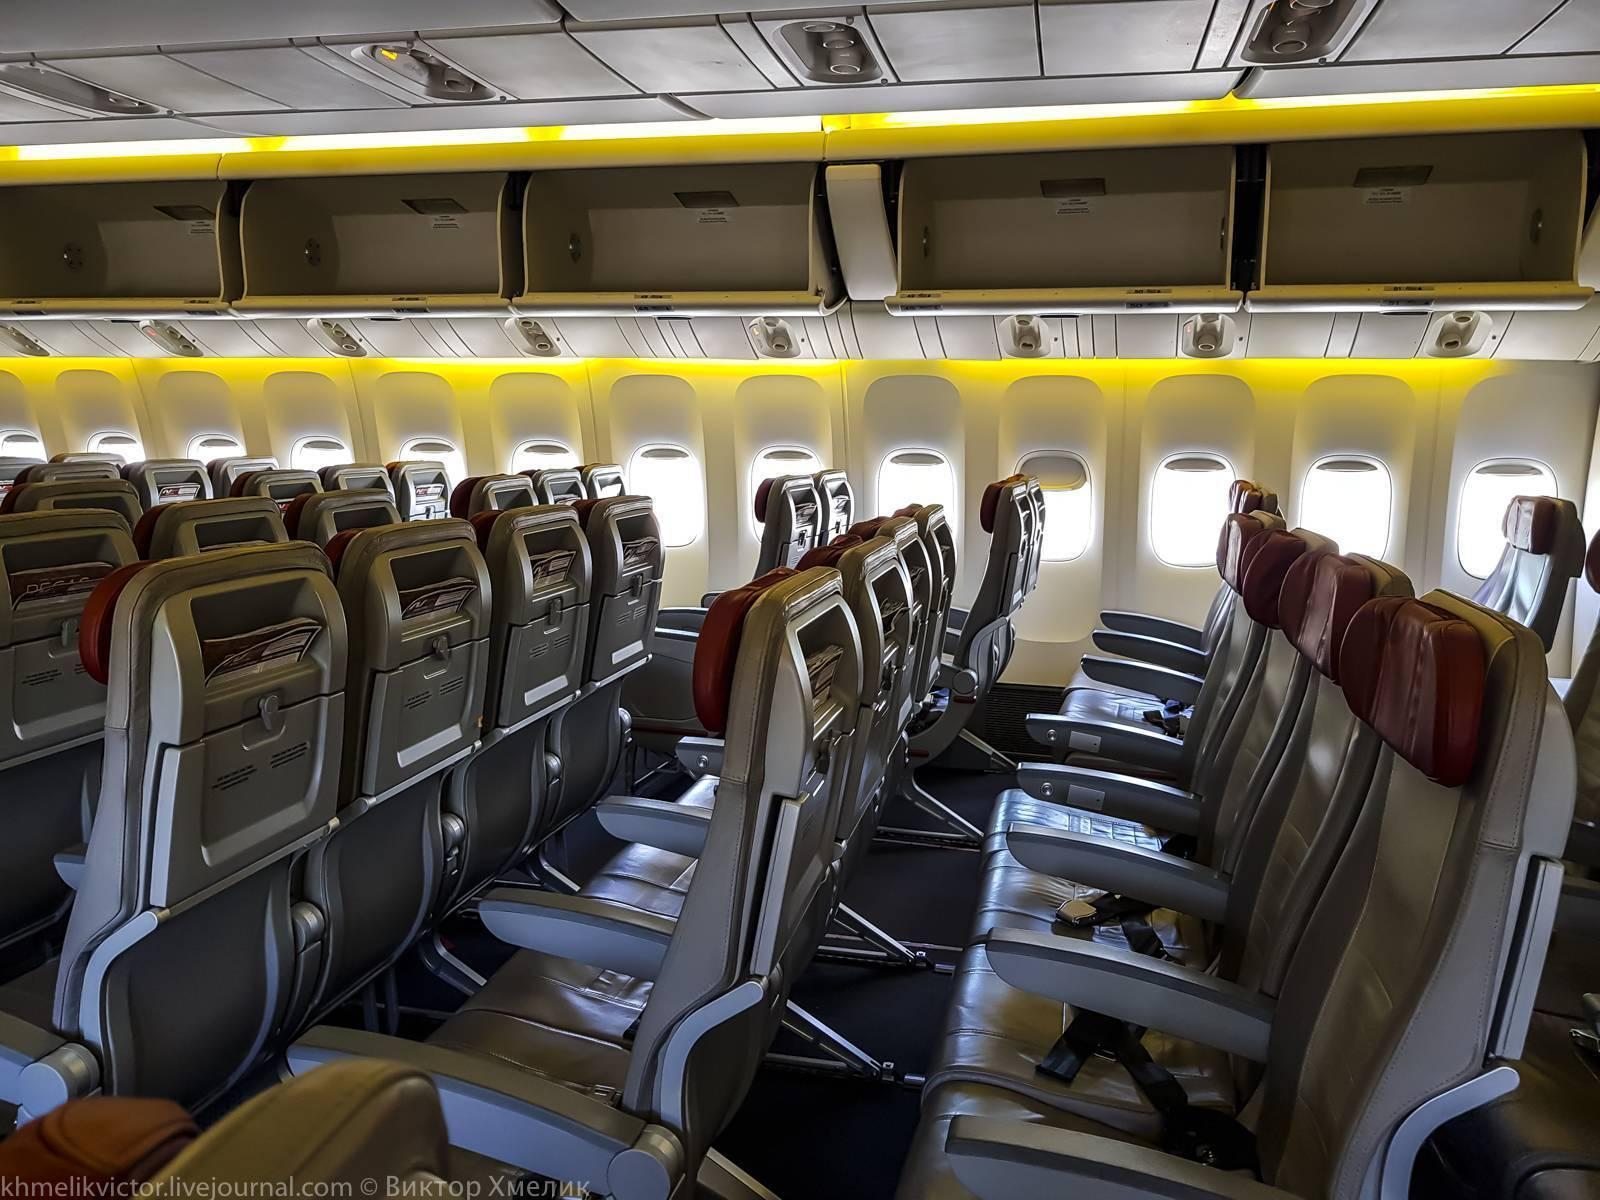 Boeing 777-200er: схема салона, лучшие места